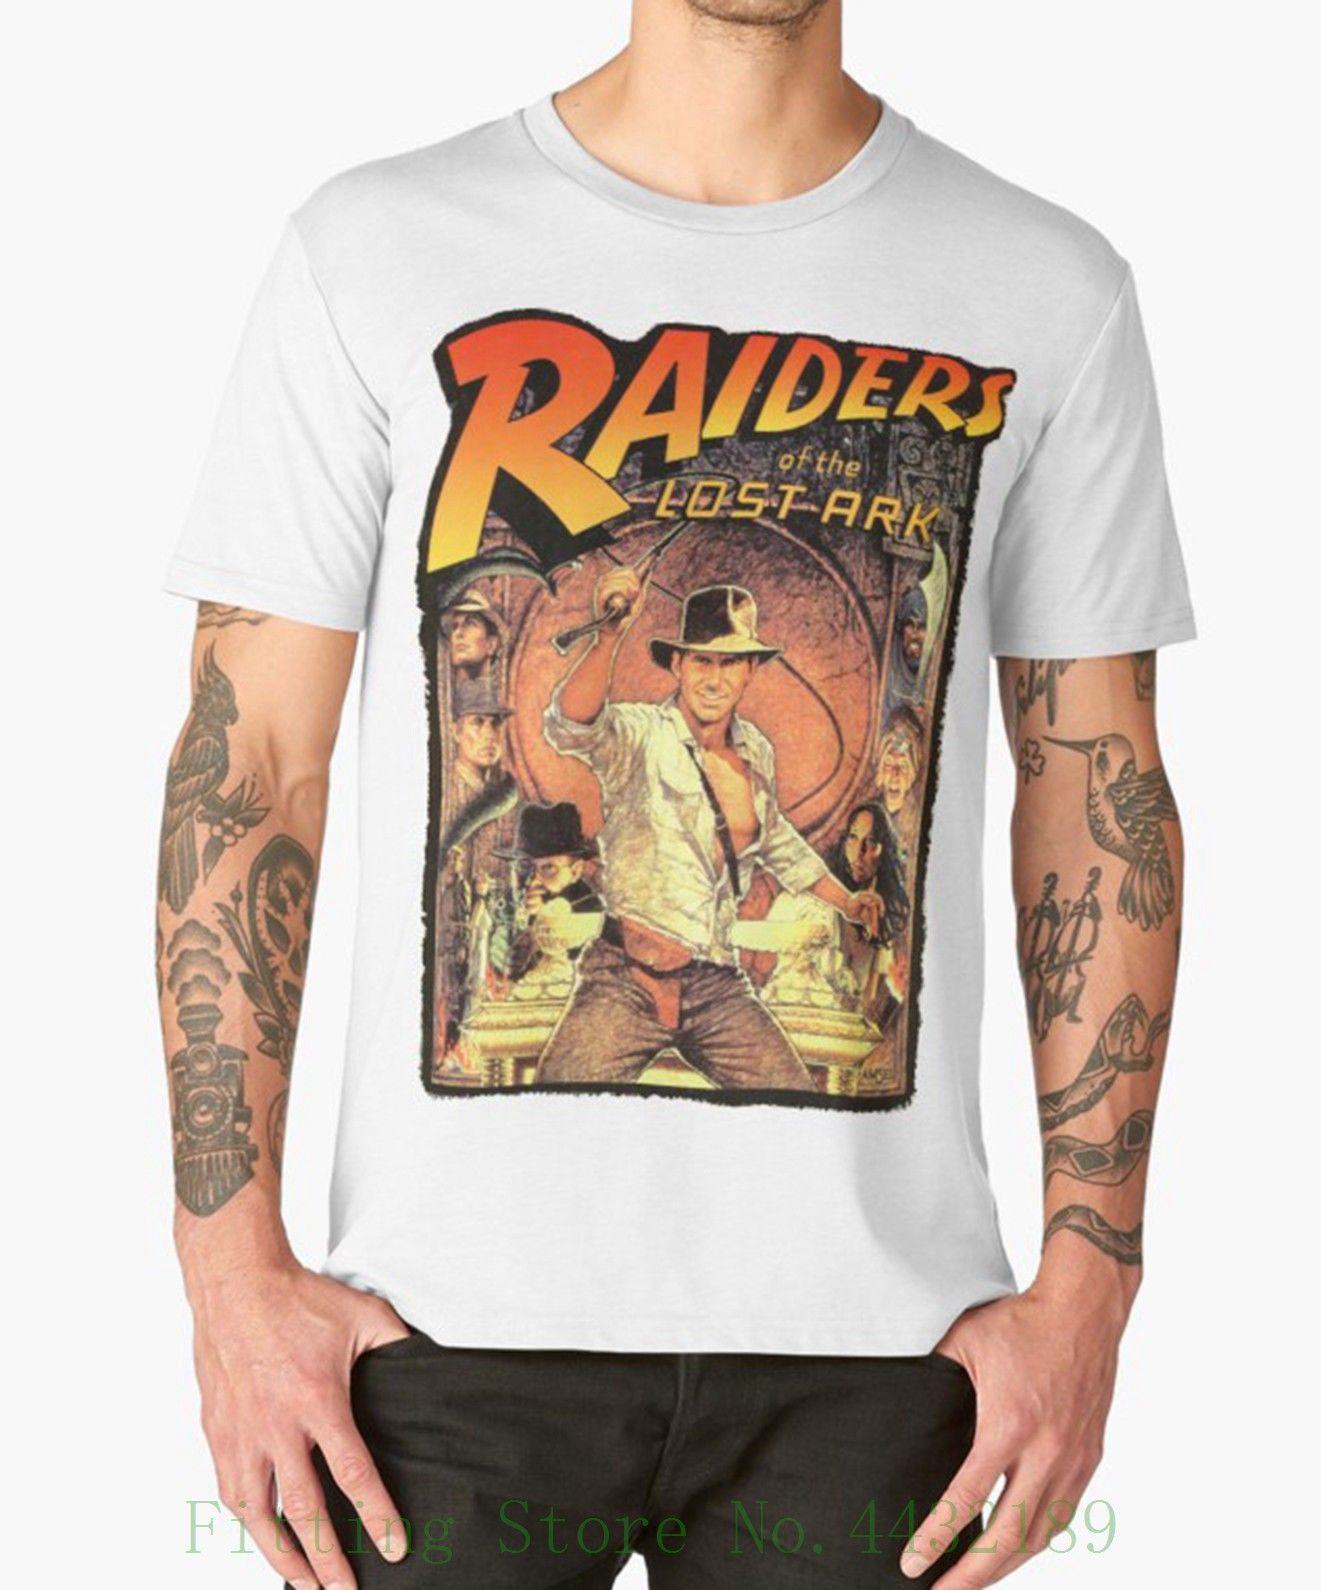 Compre Atacado Da Arca Perdida Camiseta Indiana Jones 80 s Culto Movie Film  Aniversário De Manga Curta Hipster Tees De Aaa888tshirts 4e40f5c6bdd